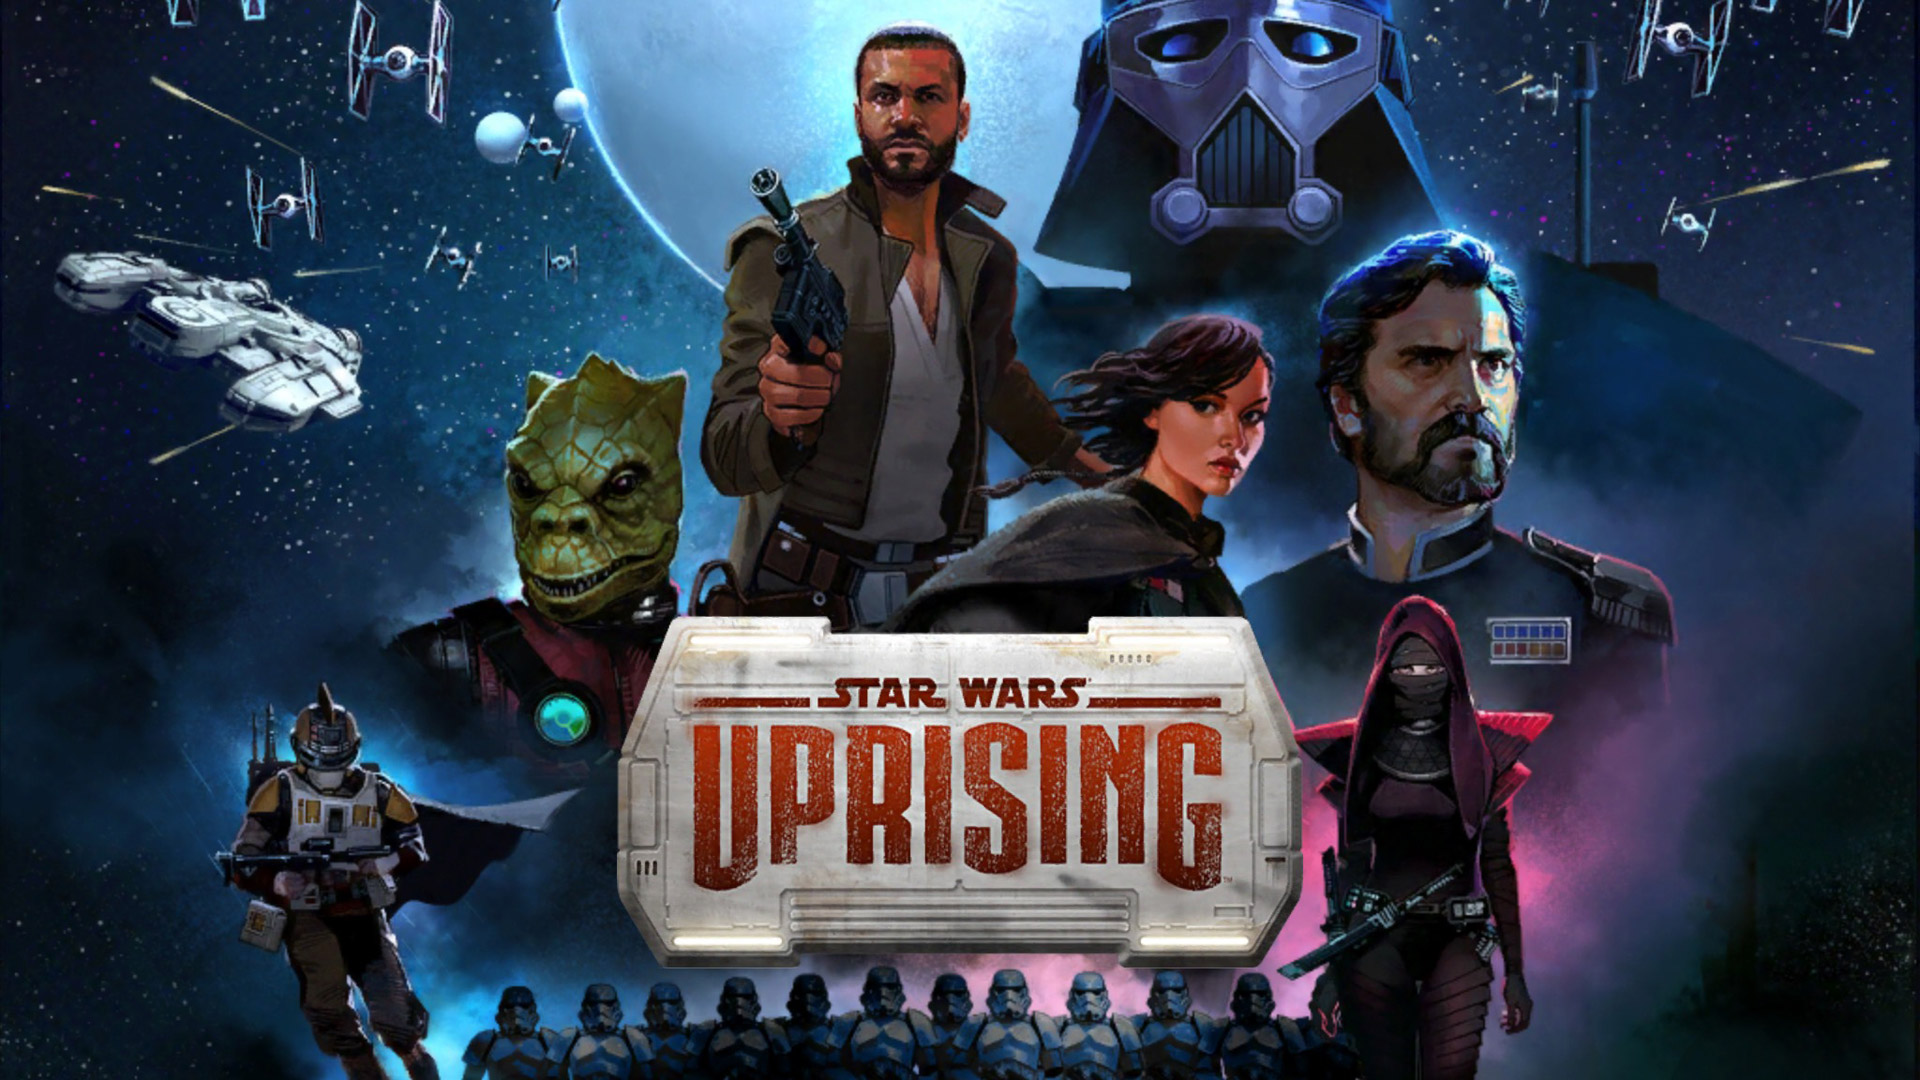 Free Star Wars: Uprising Wallpaper in 1920x1080